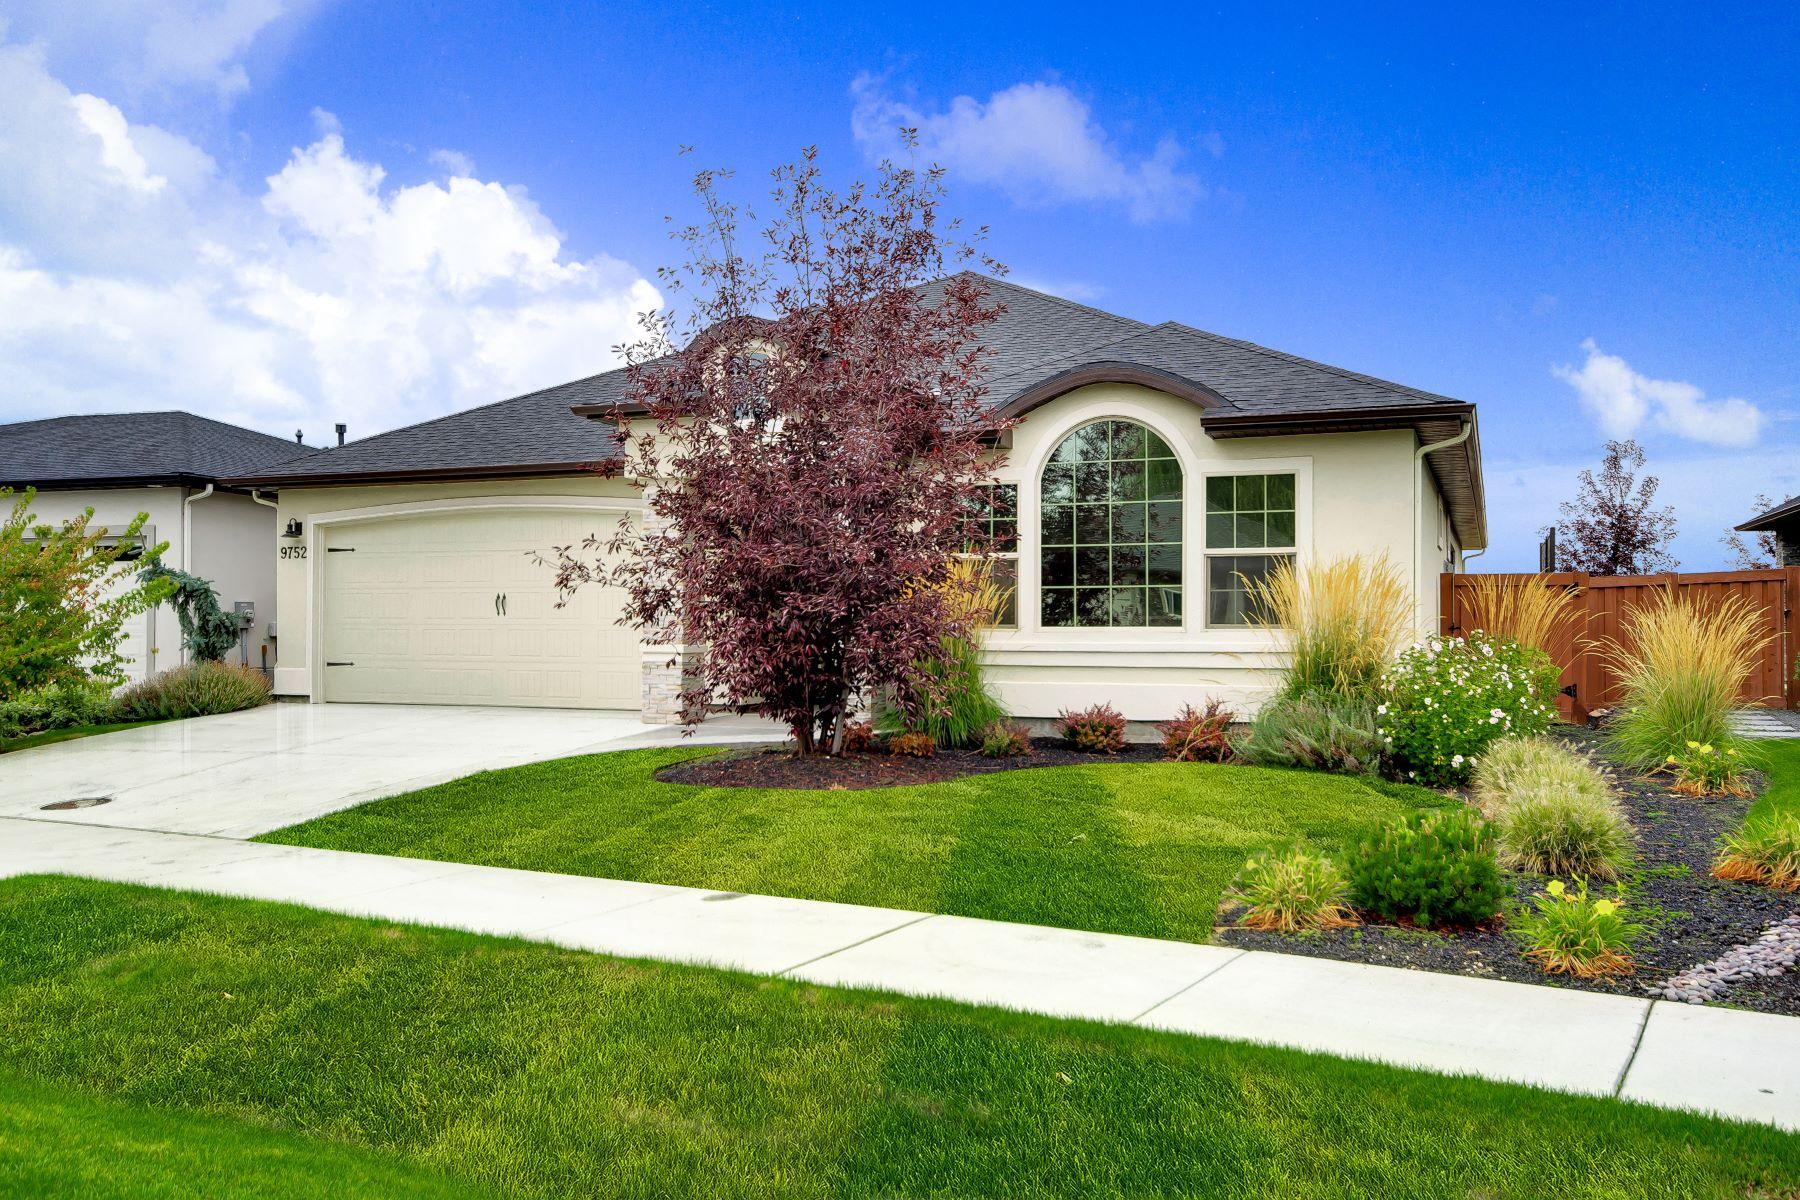 Single Family Homes pour l Vente à 9752 Wildbranch, Star 9752 W Wildbranch Star, Idaho 83669 États-Unis